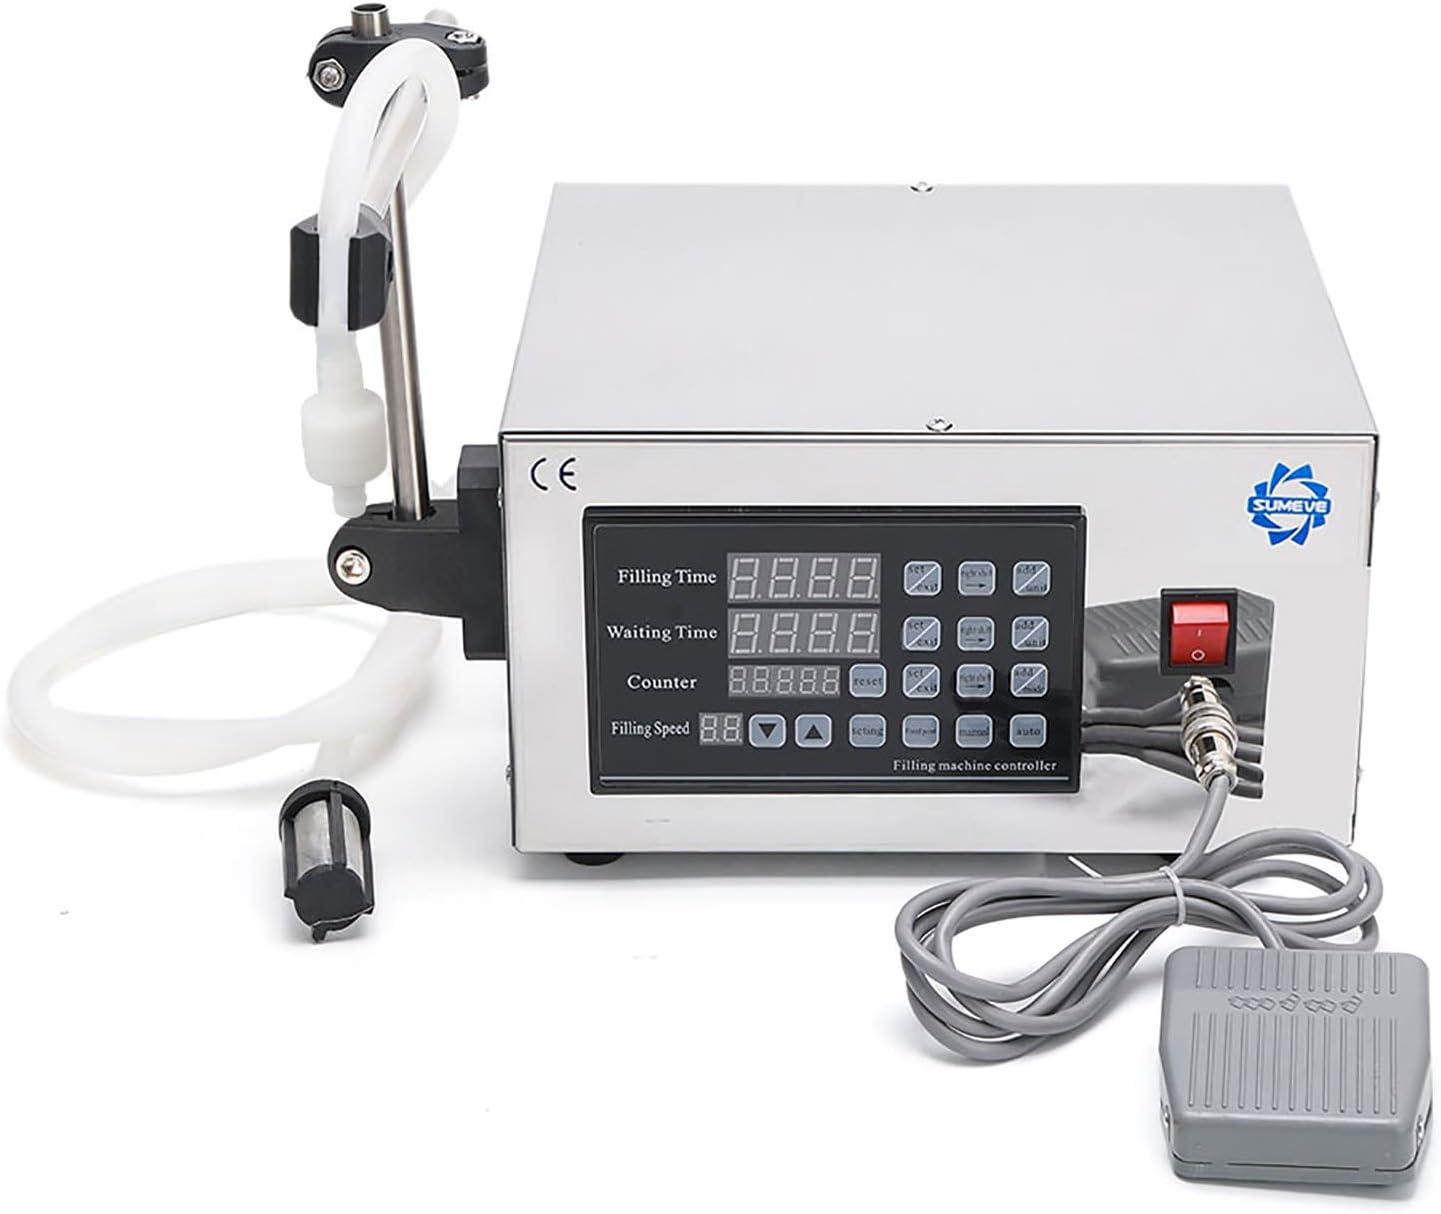 Sumeve Liquid Filling Machine Automatic Digital Control Bottle Filler(2-3500ml Digital Filling) GFK280